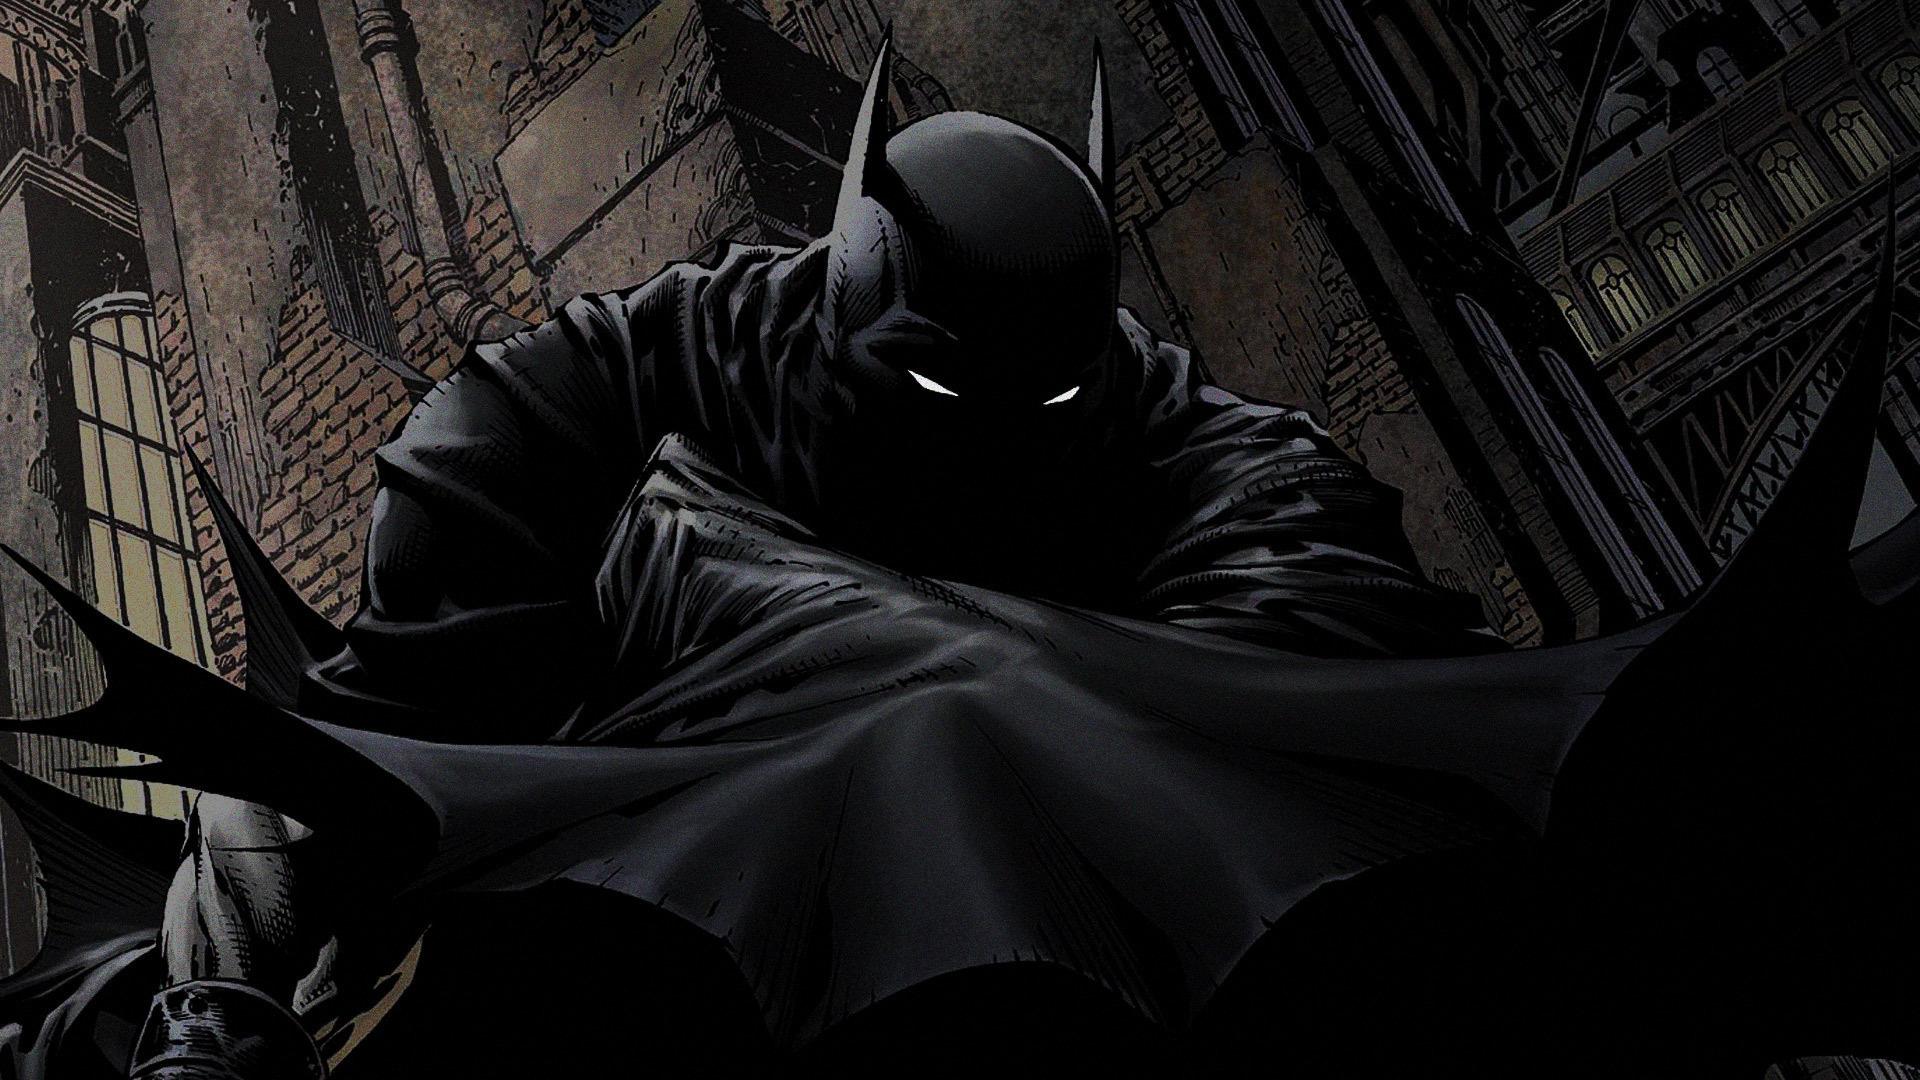 batman dark hd wallpapers download movies wallpapers 1920x1080